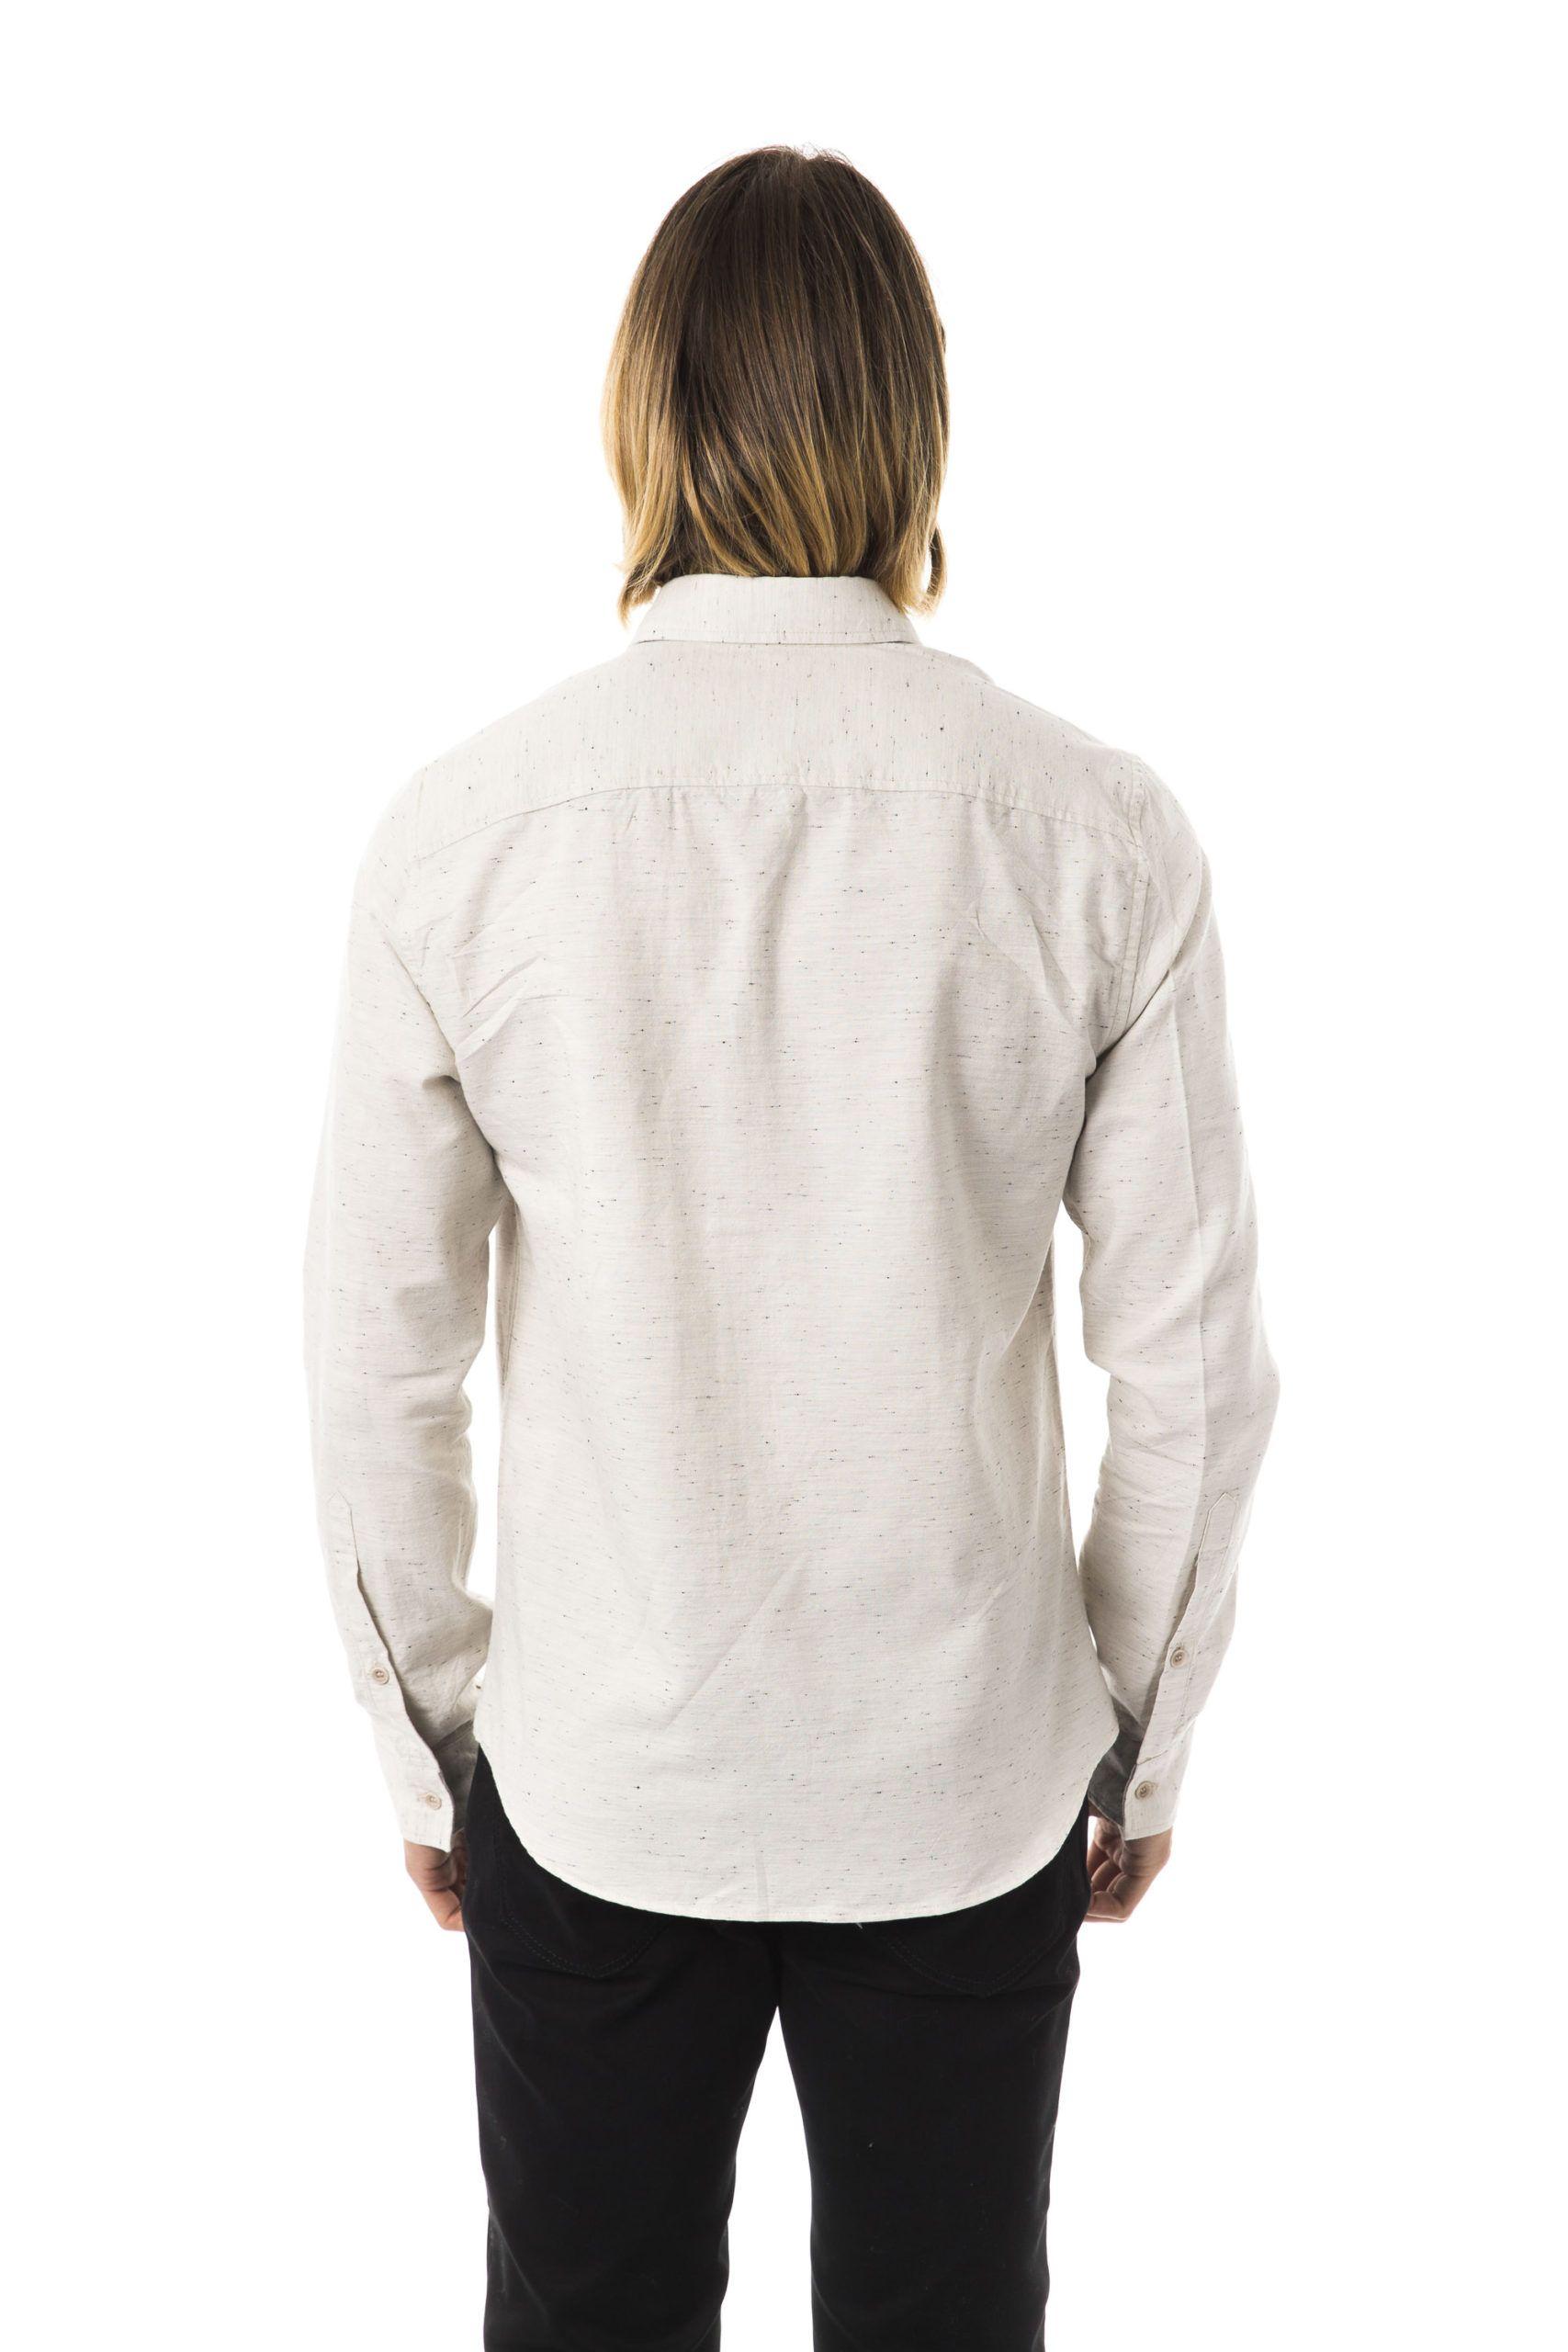 BYBLOS Sandbis Shirt